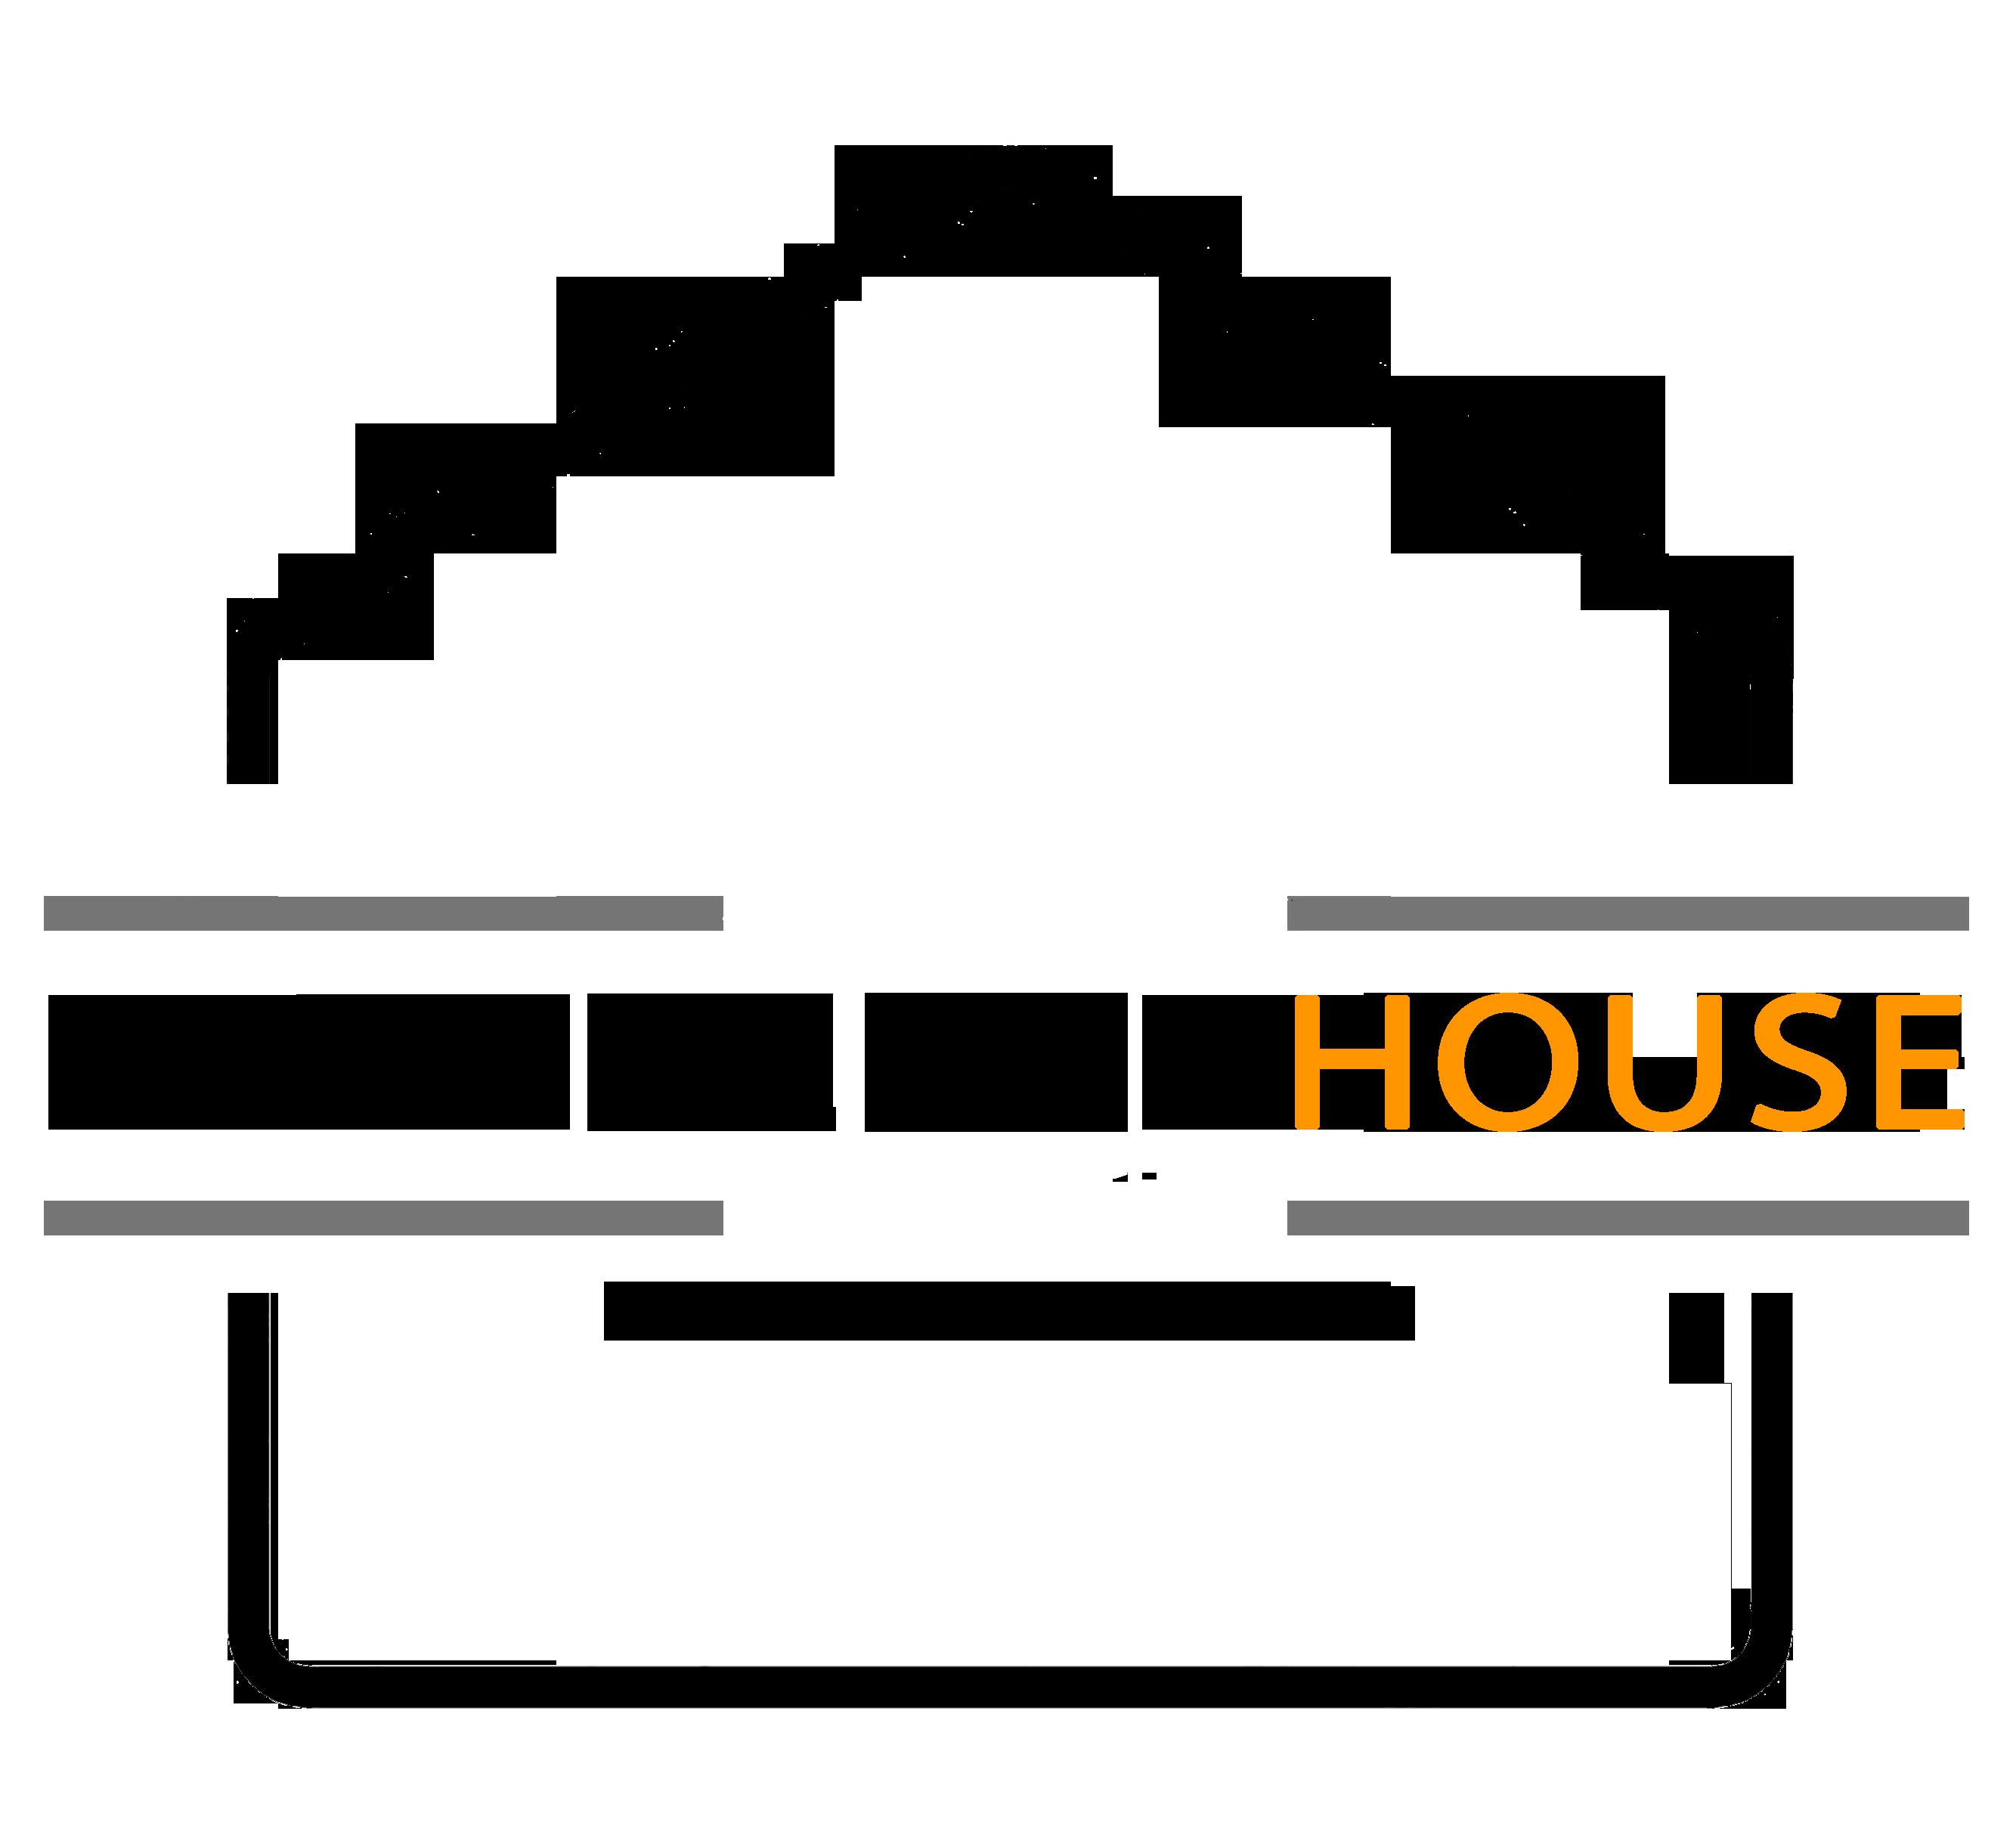 Emergency House